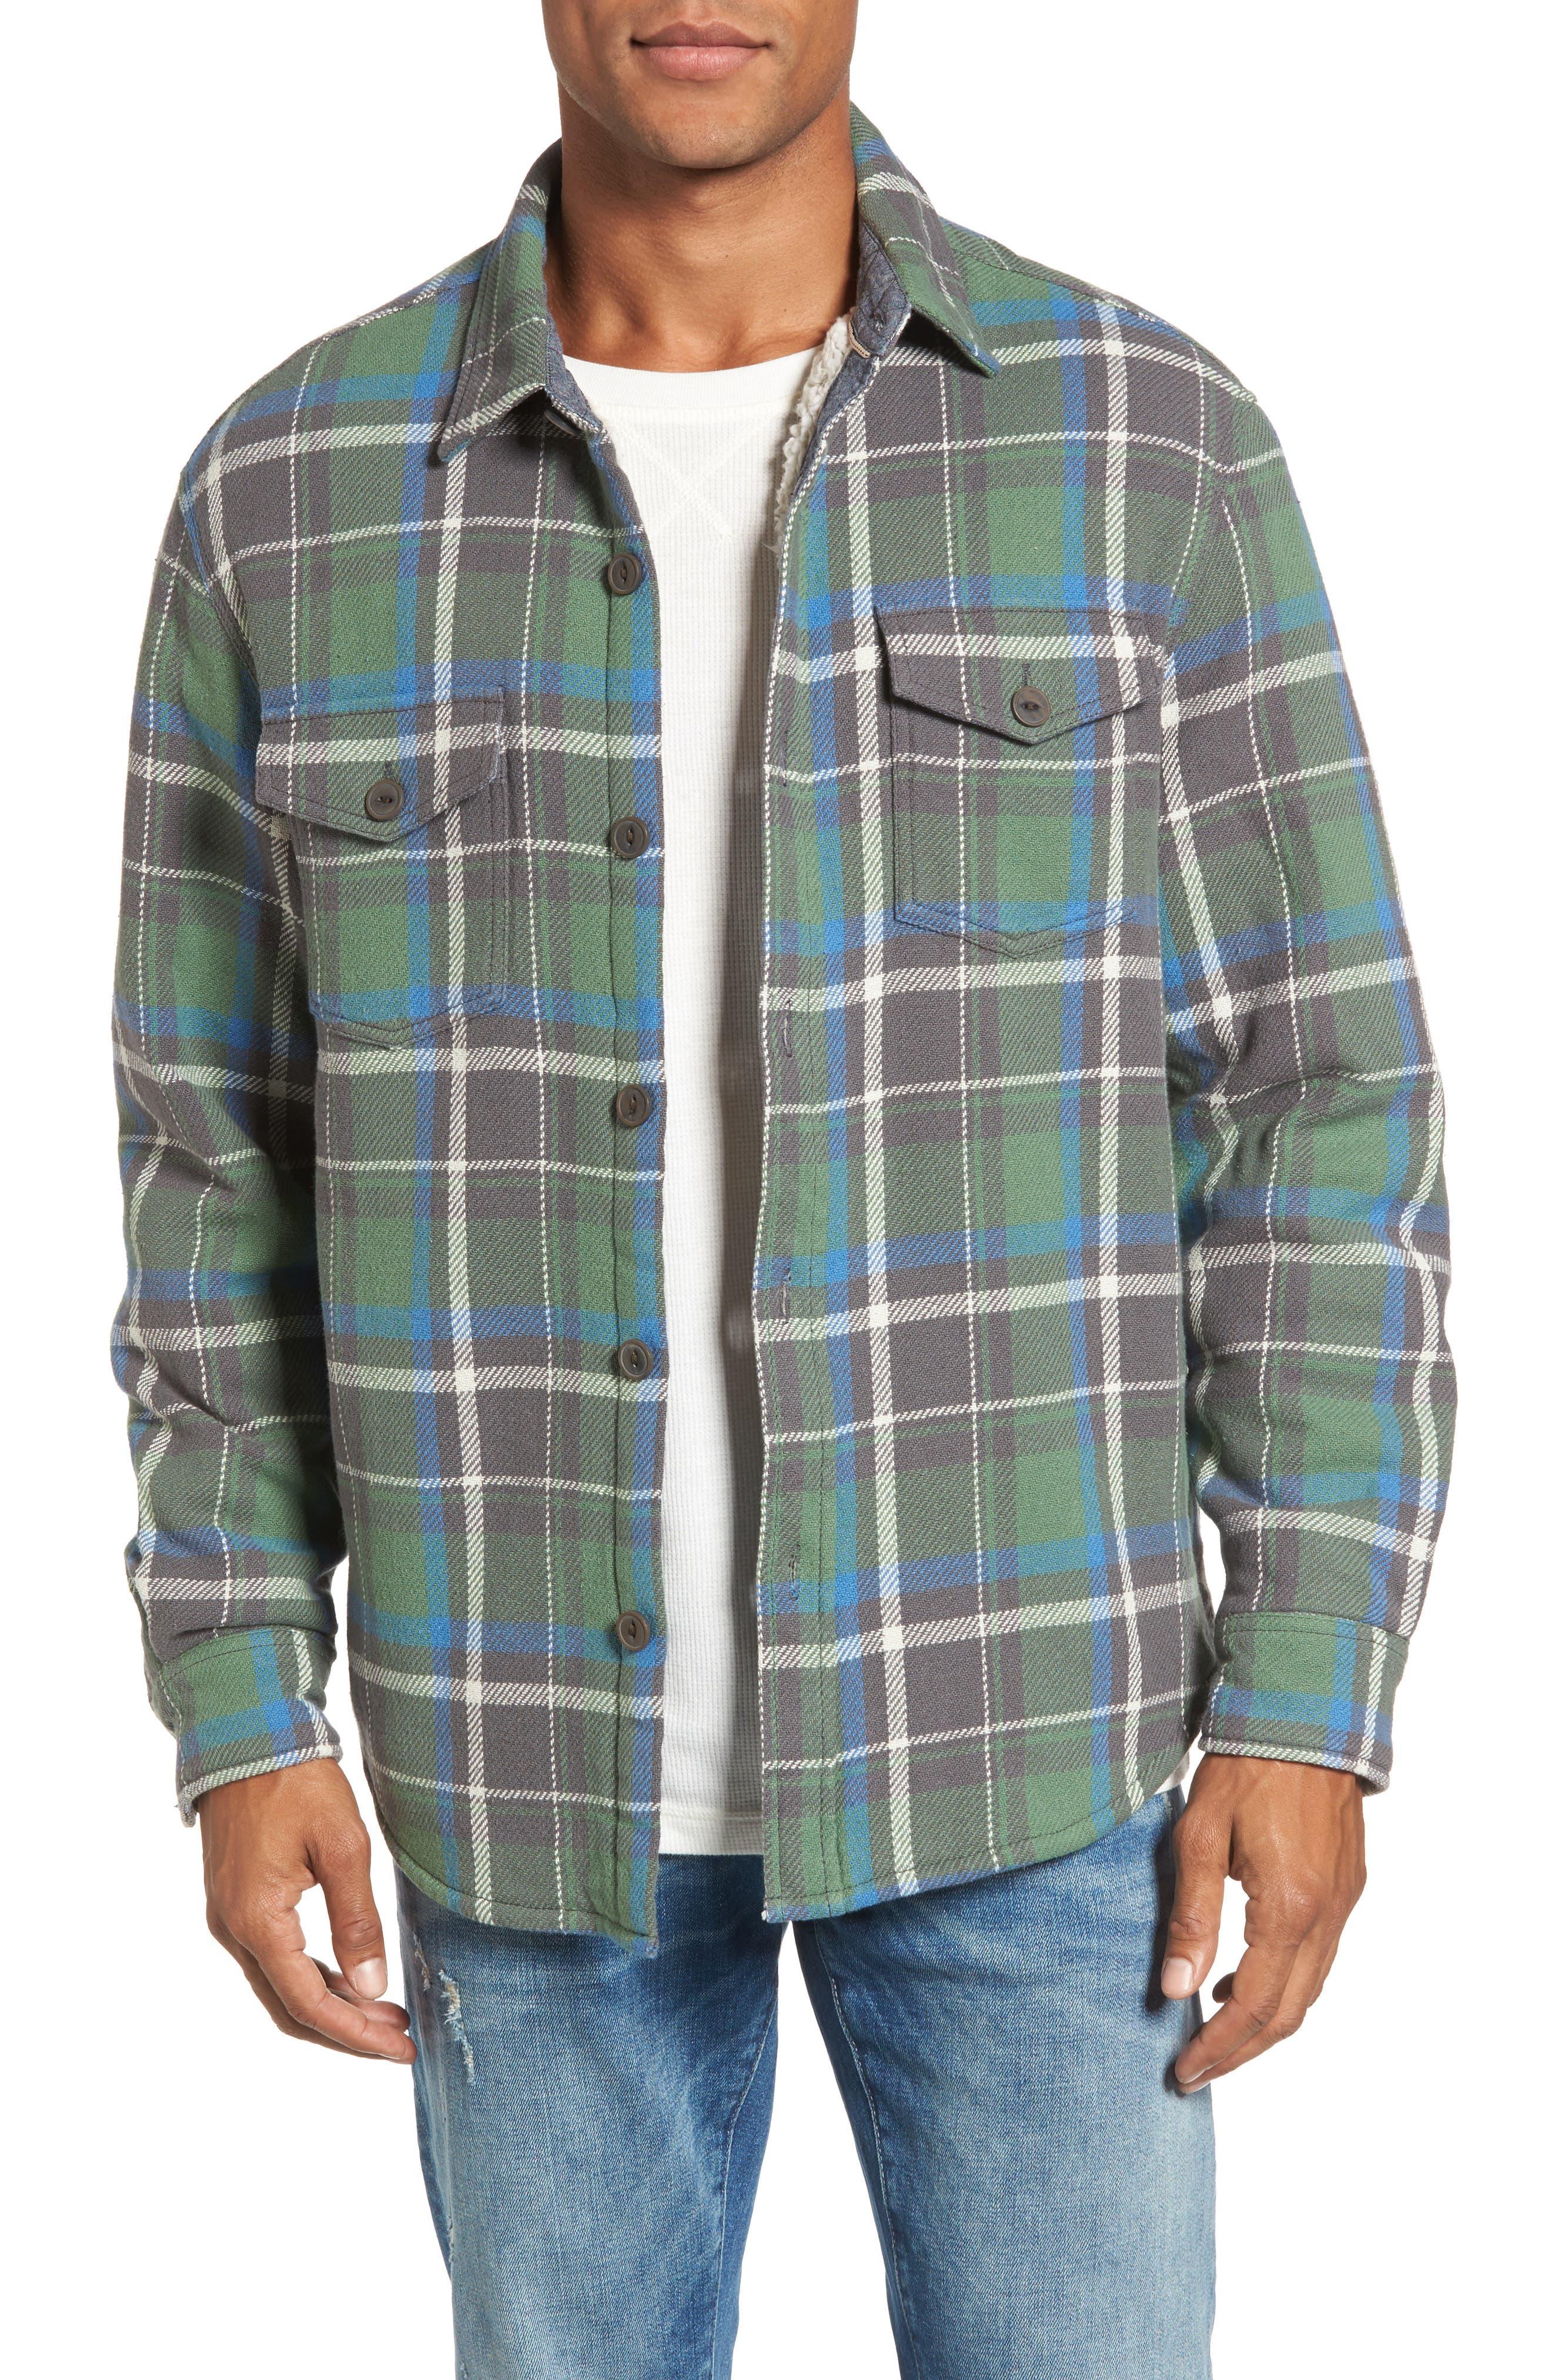 Summit Hunter Plaid Faux Shearling Lined Shirt Jacket,                         Main,                         color, Charcoal/ Green